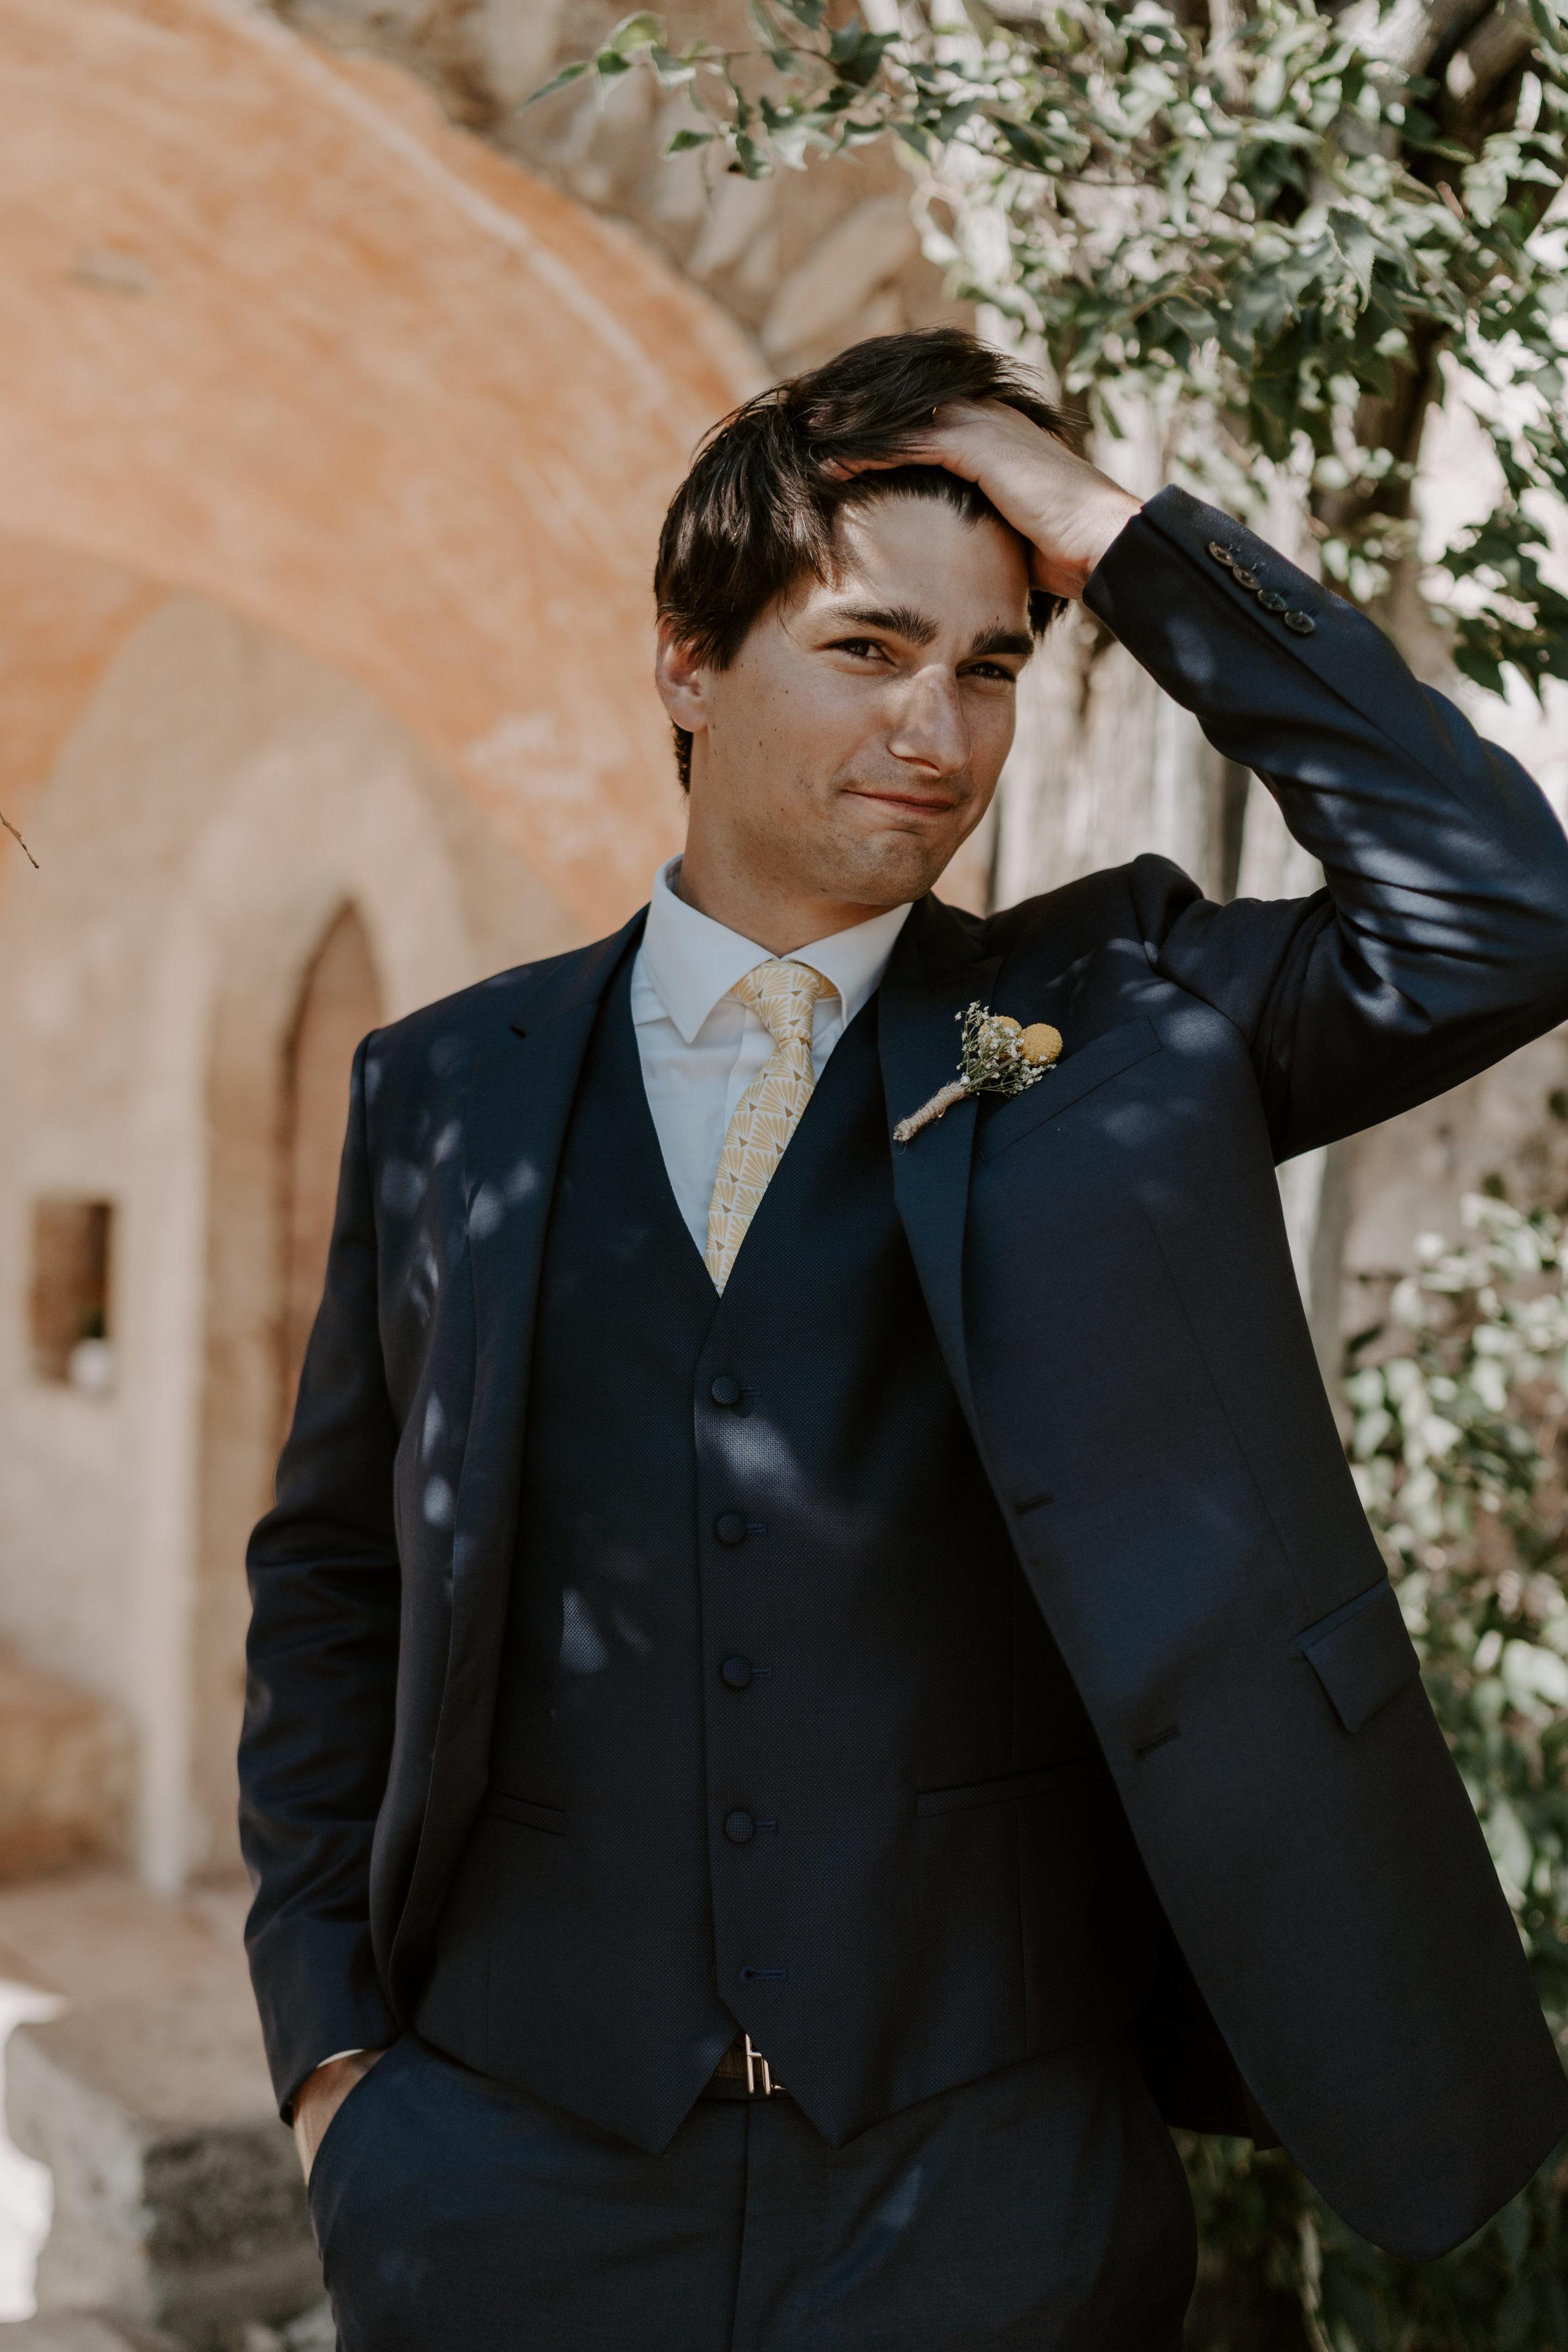 elsacaza_photographe_mariage_Juliette_Nicolas-404.jpg